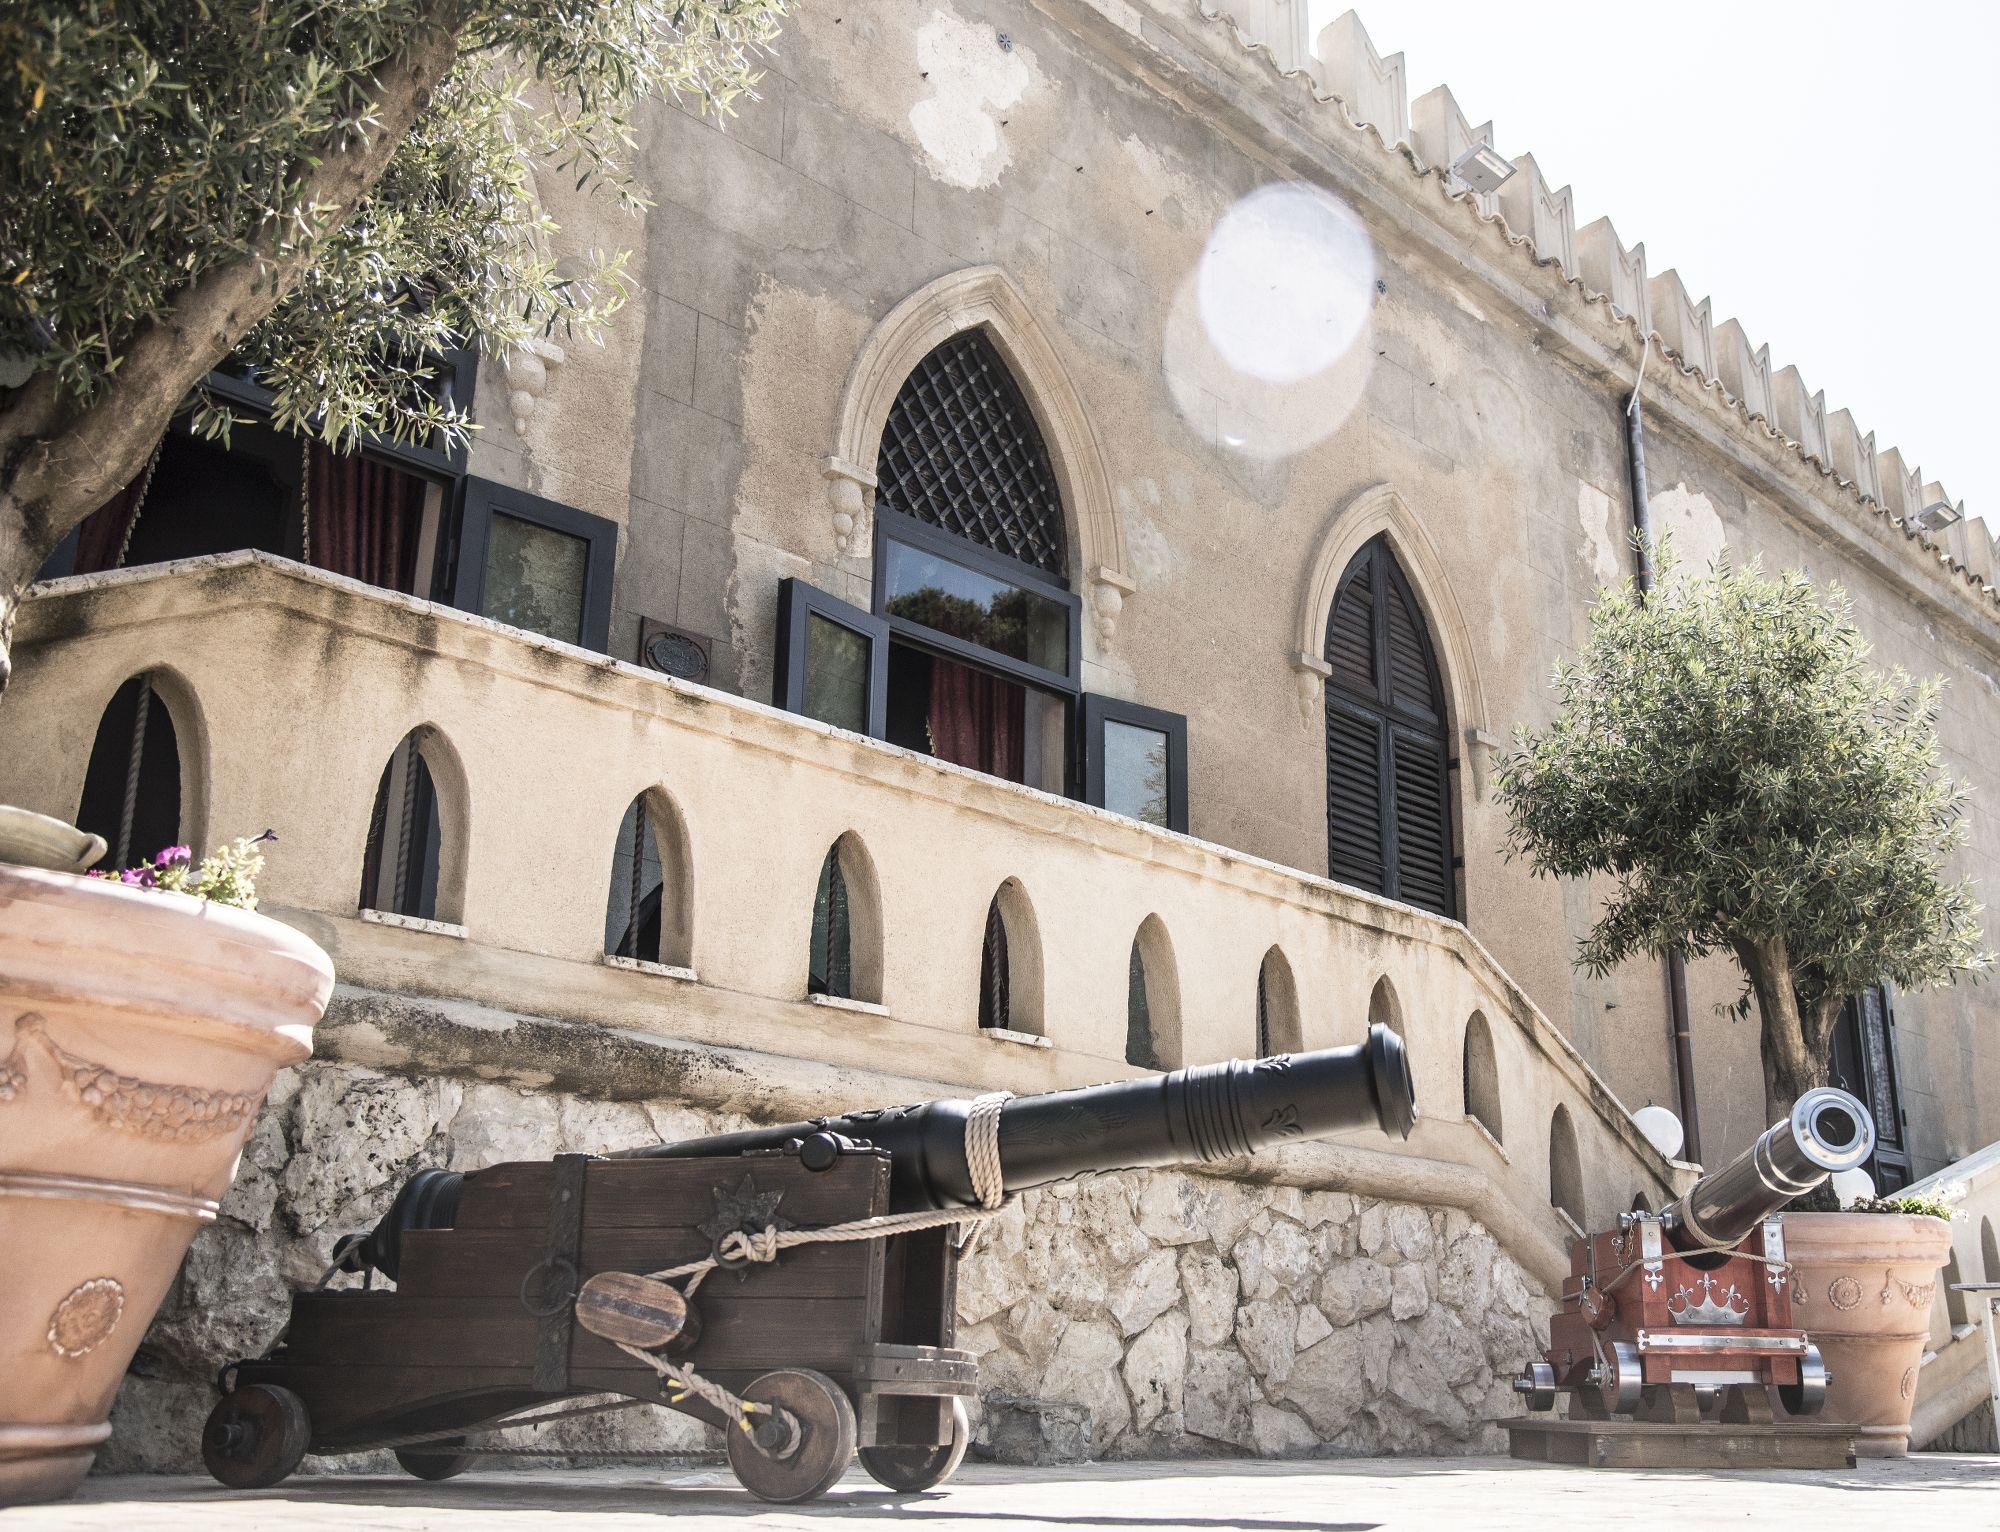 Arredamento Medievale ~ Arredamento giardino garden furniture antique cannon